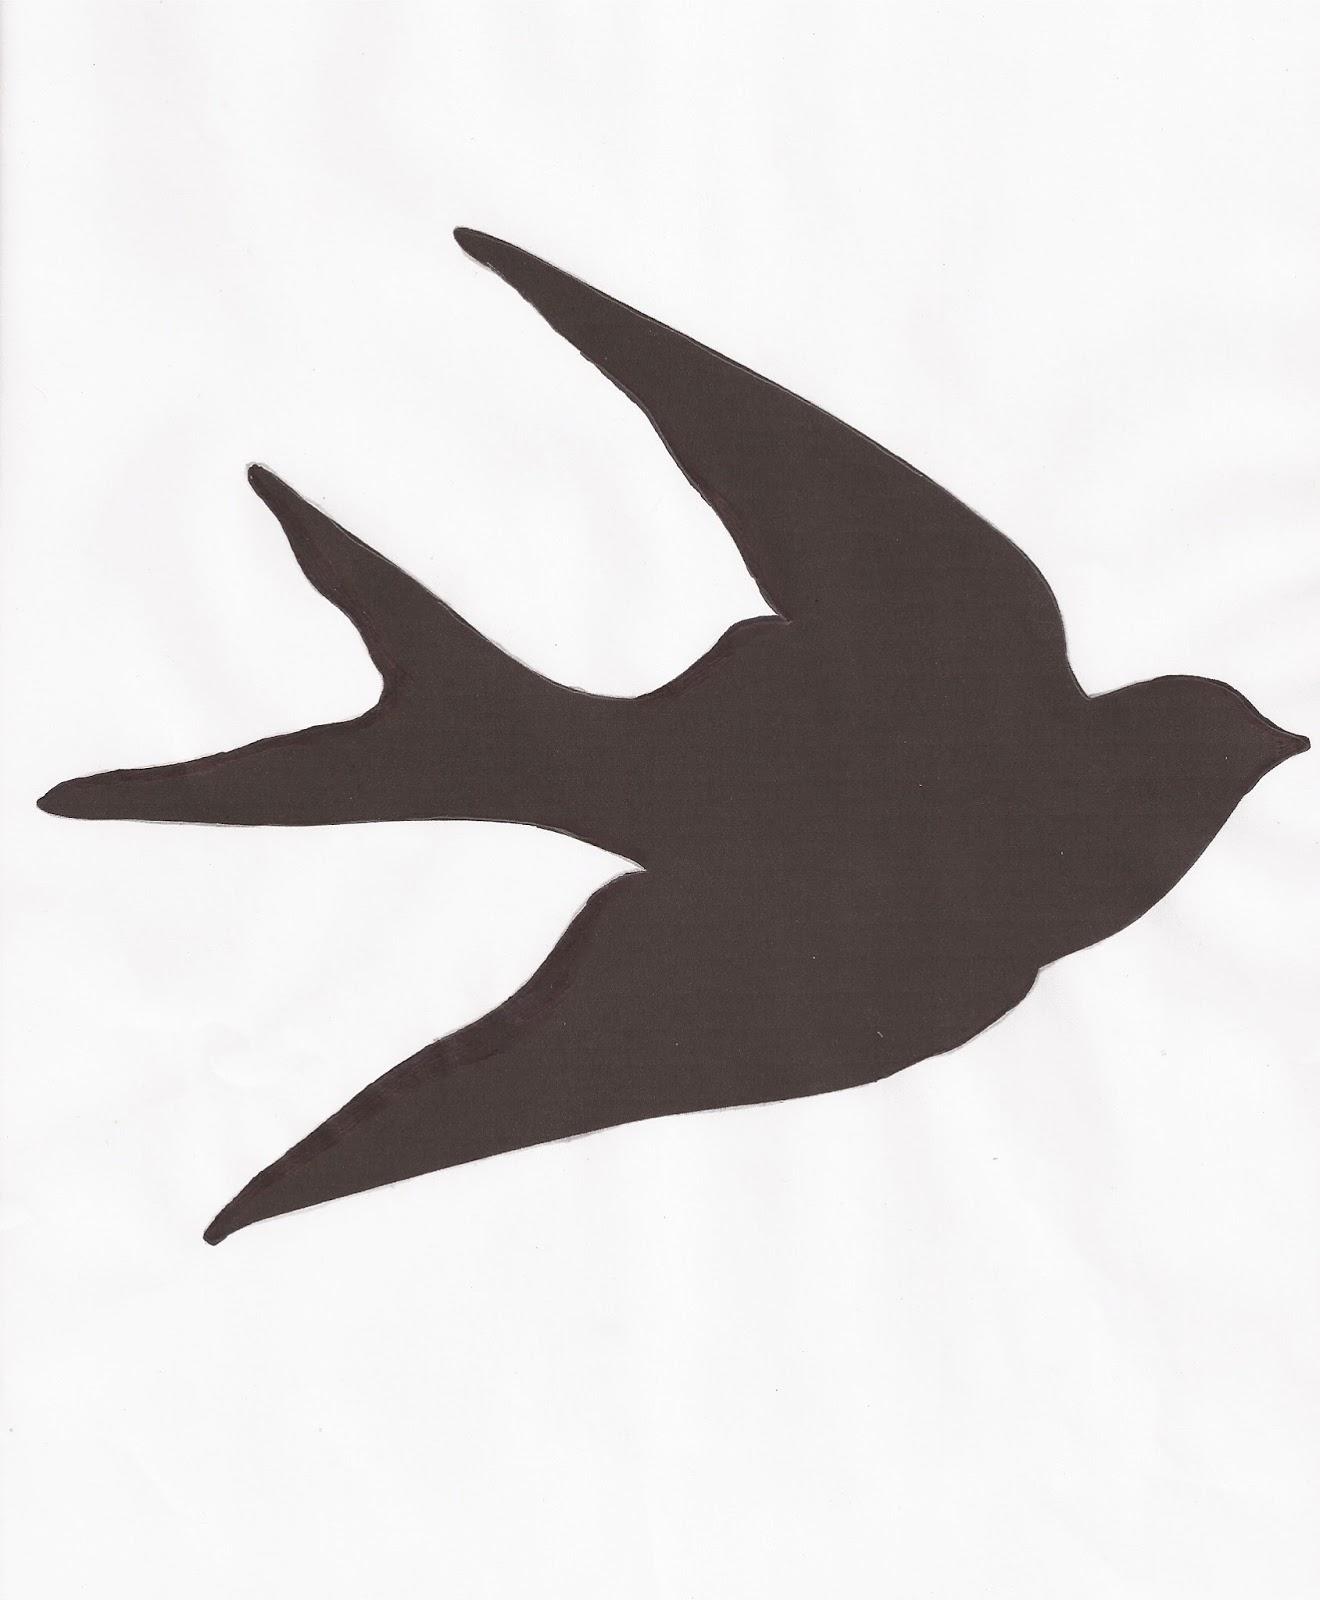 bird template - novasatfm.tk